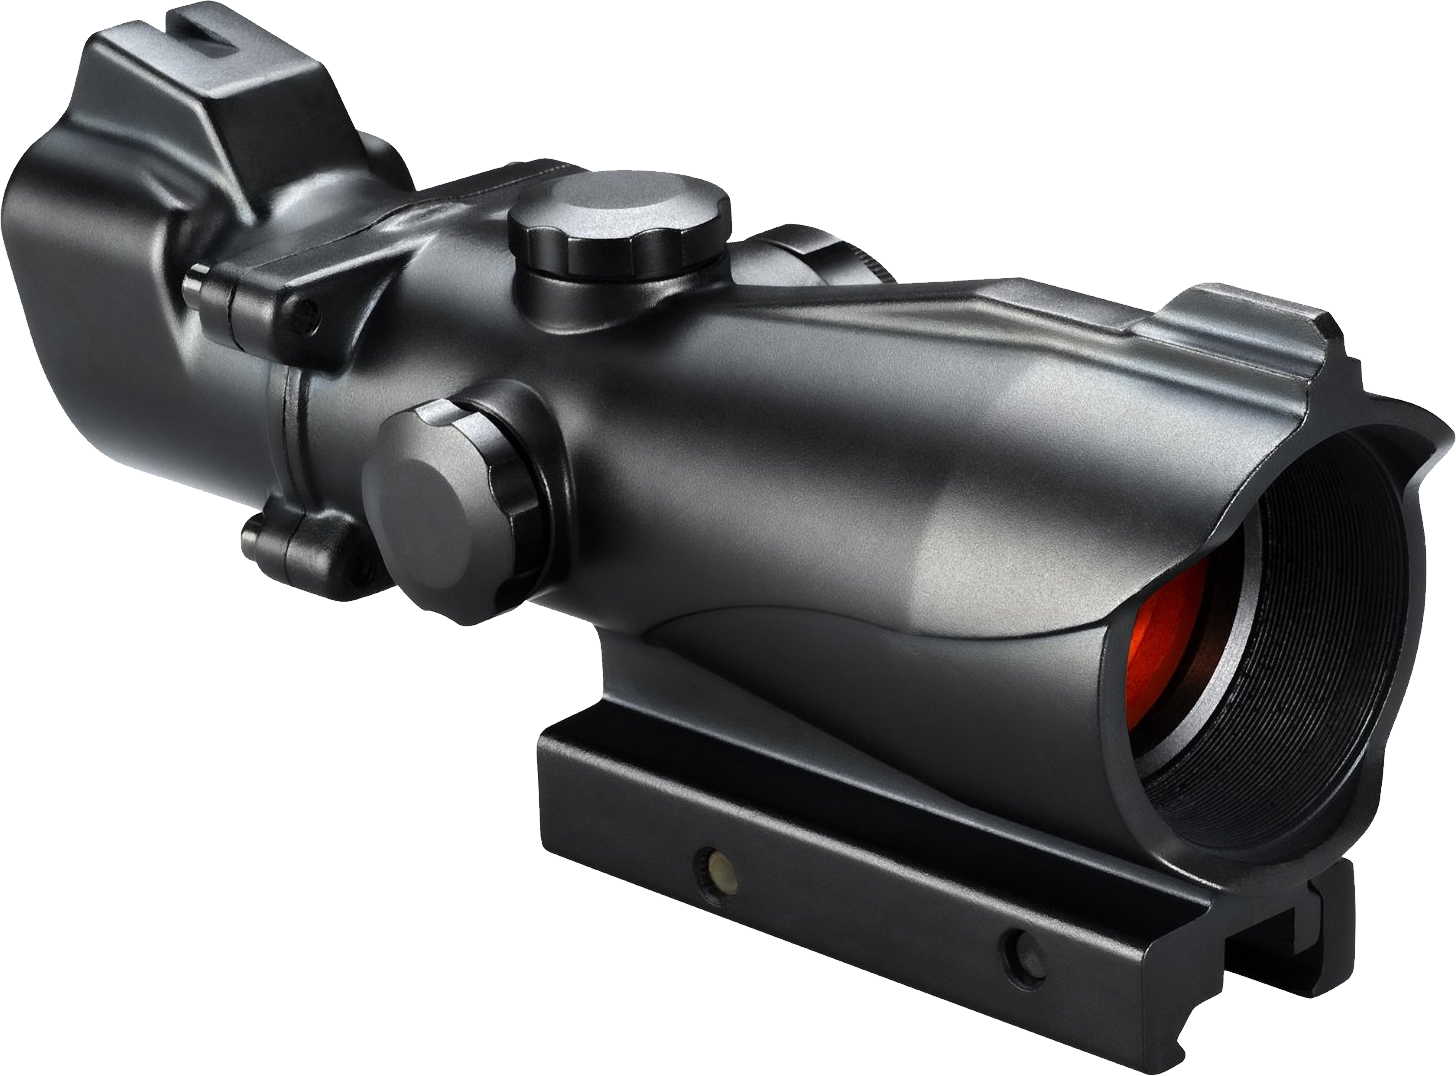 Metal scope